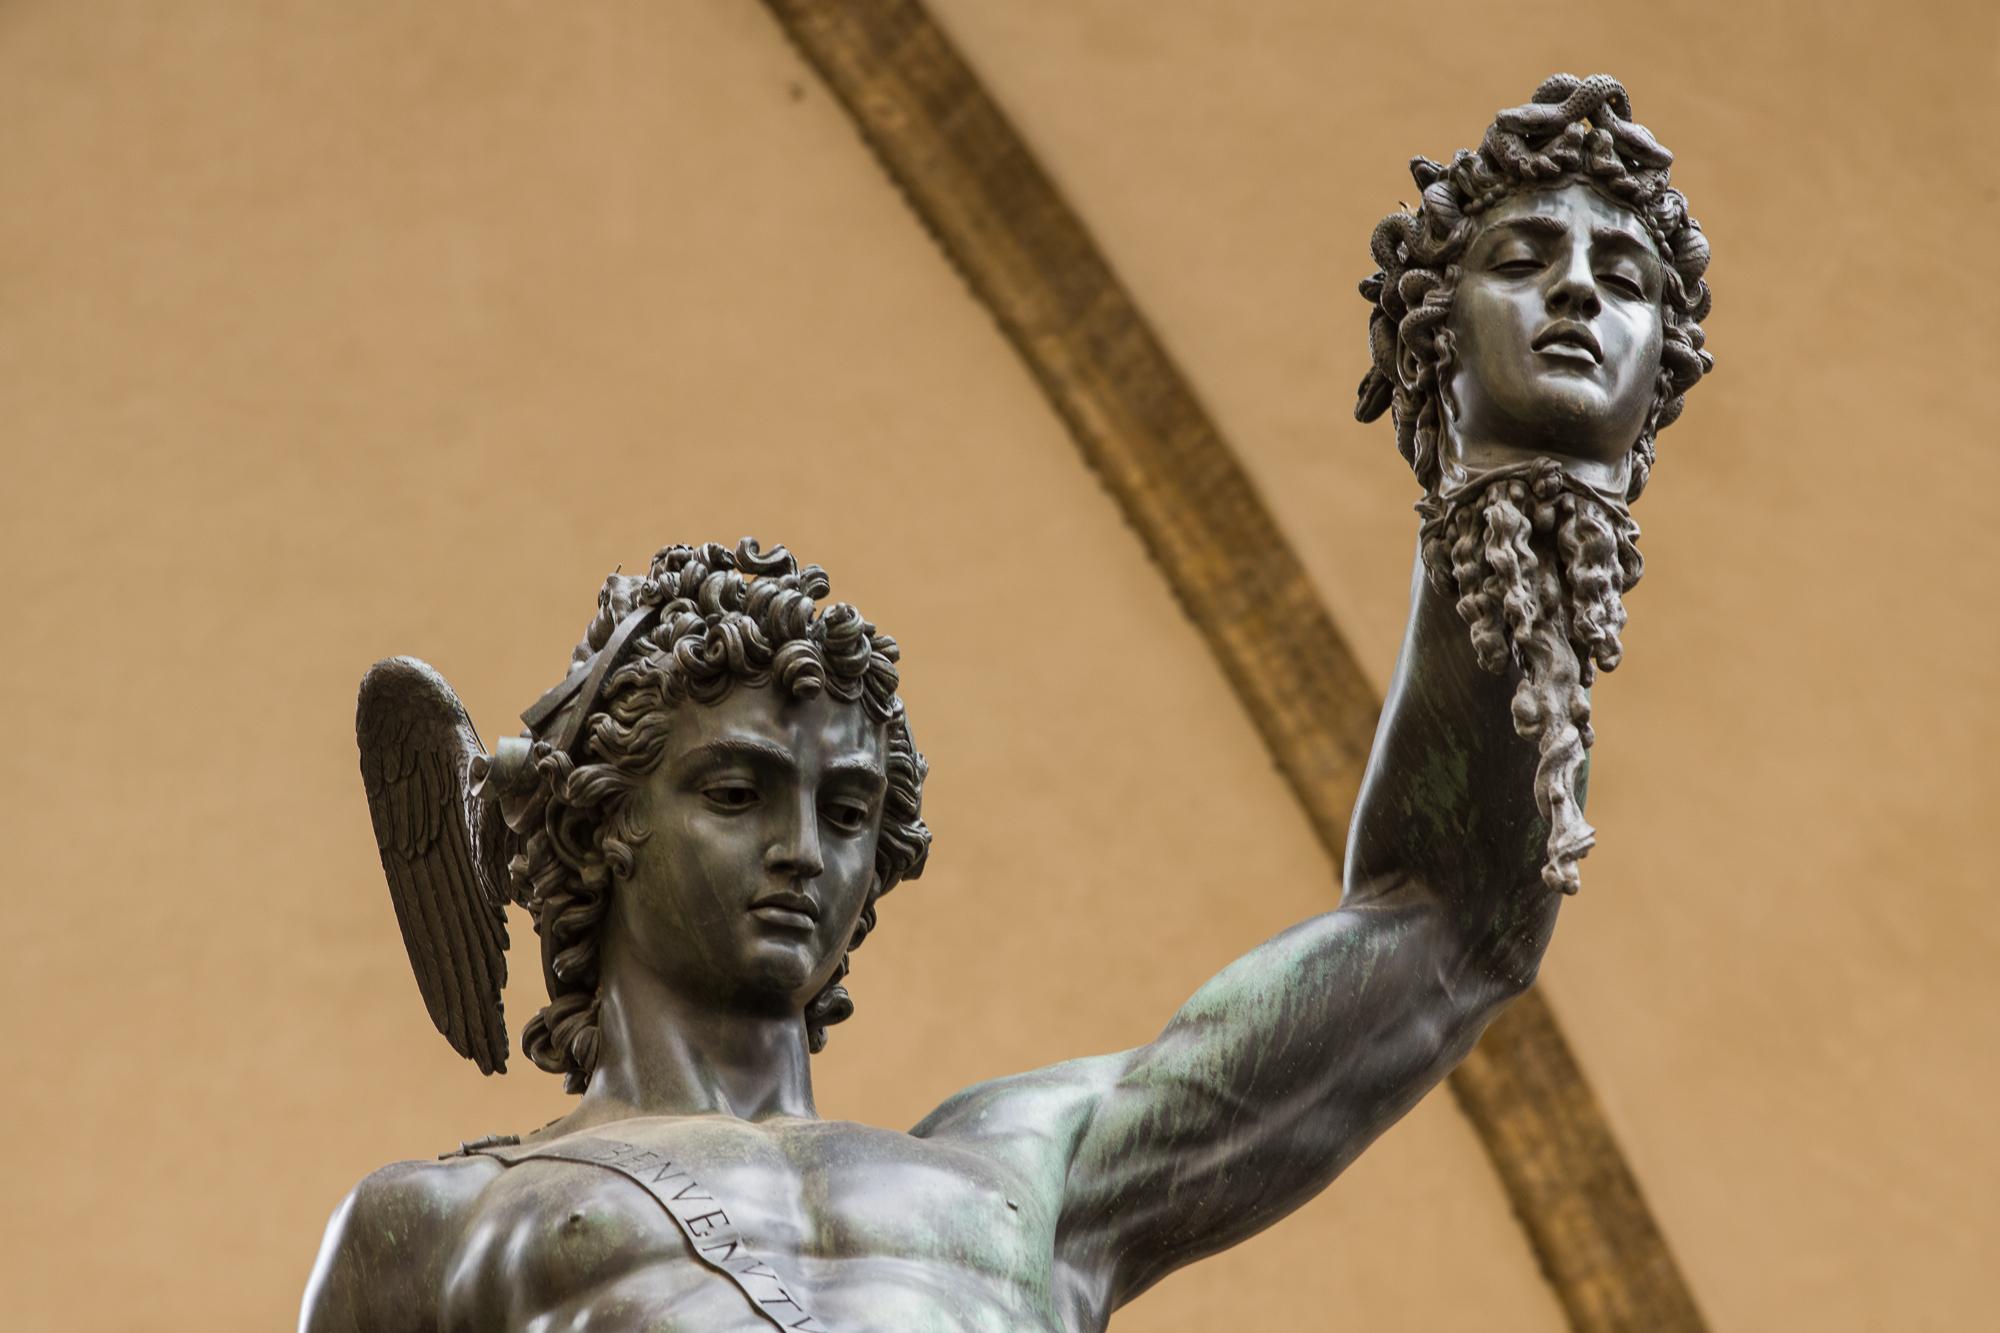 Sculpture of Medusa in Florence